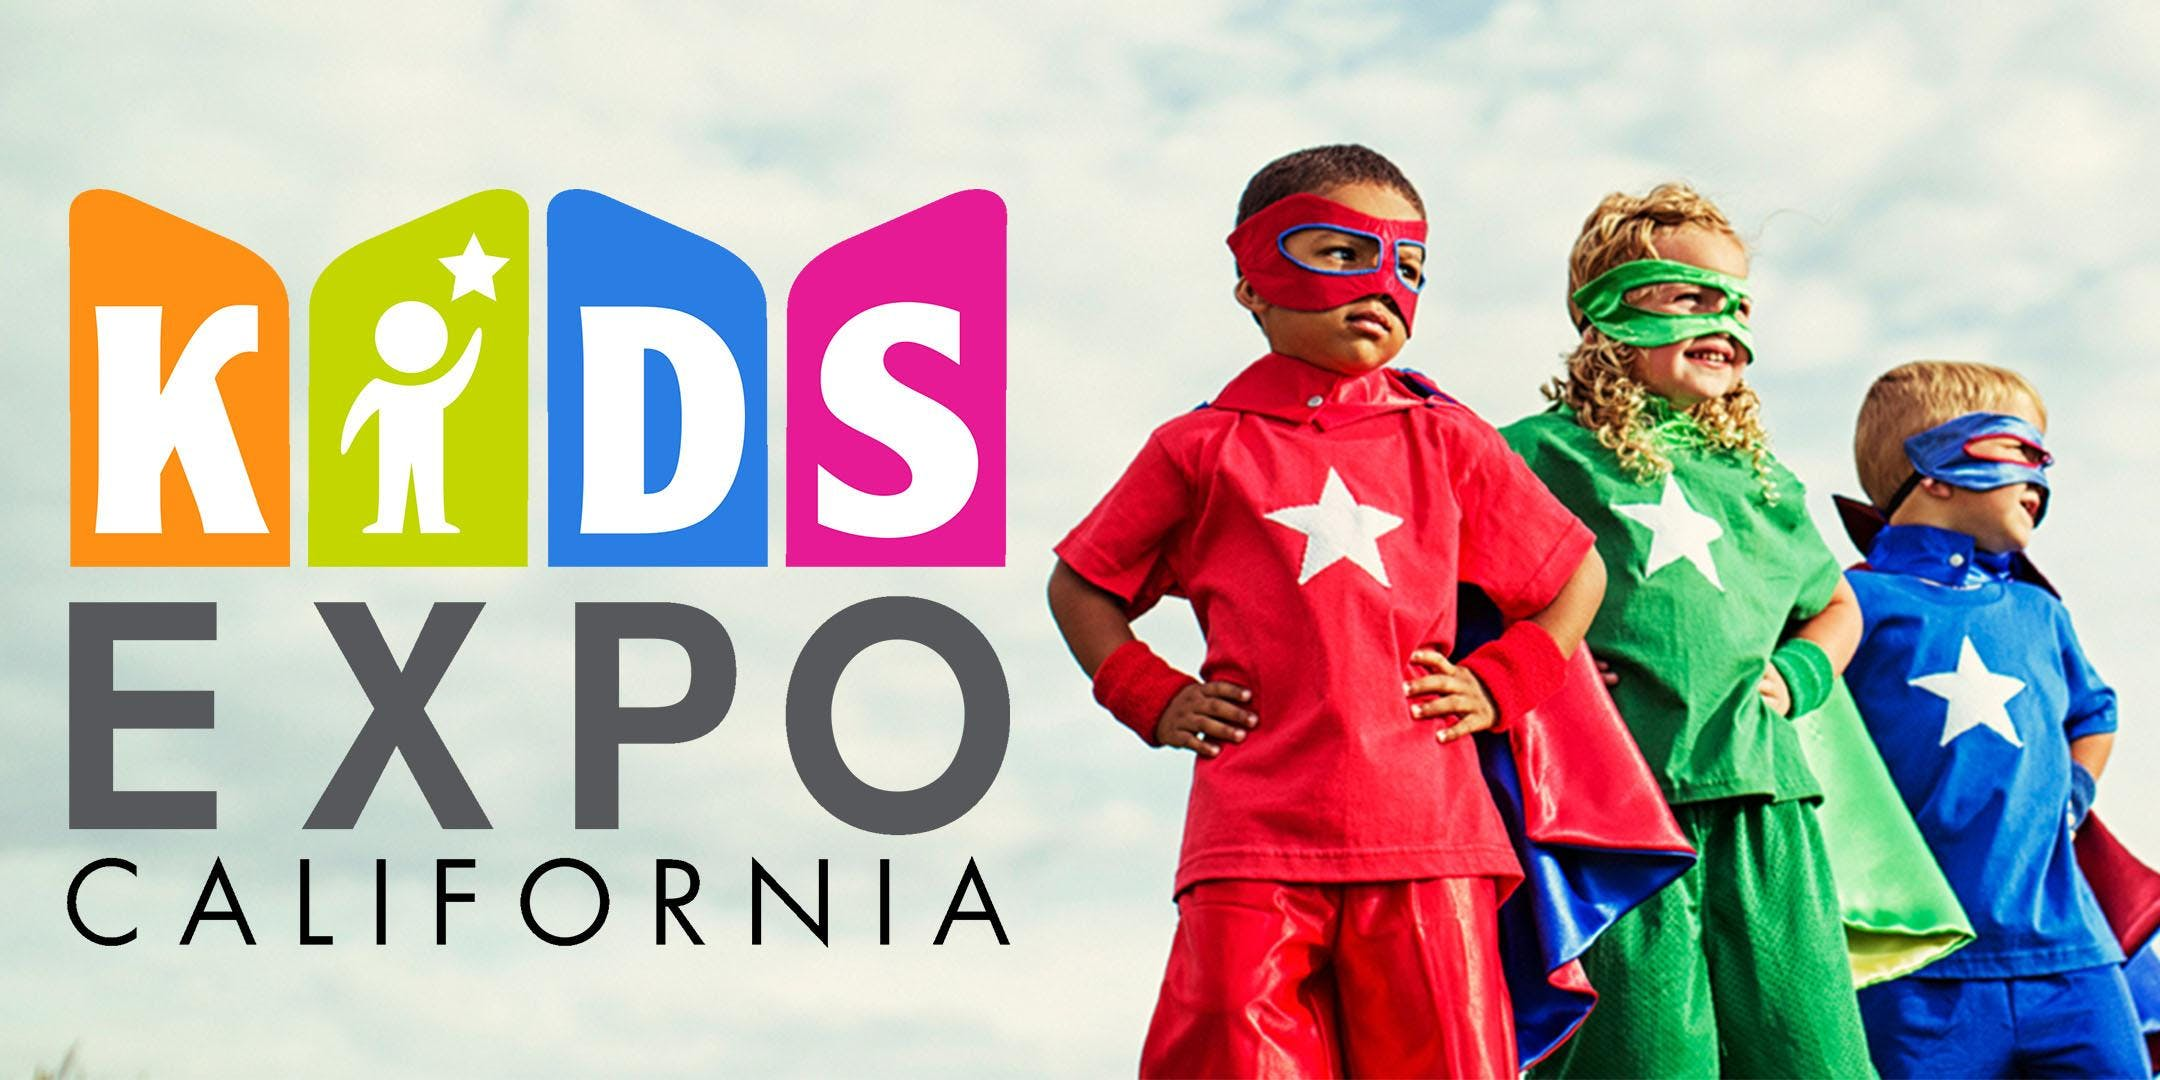 Los Angeles Kids Expo 2019